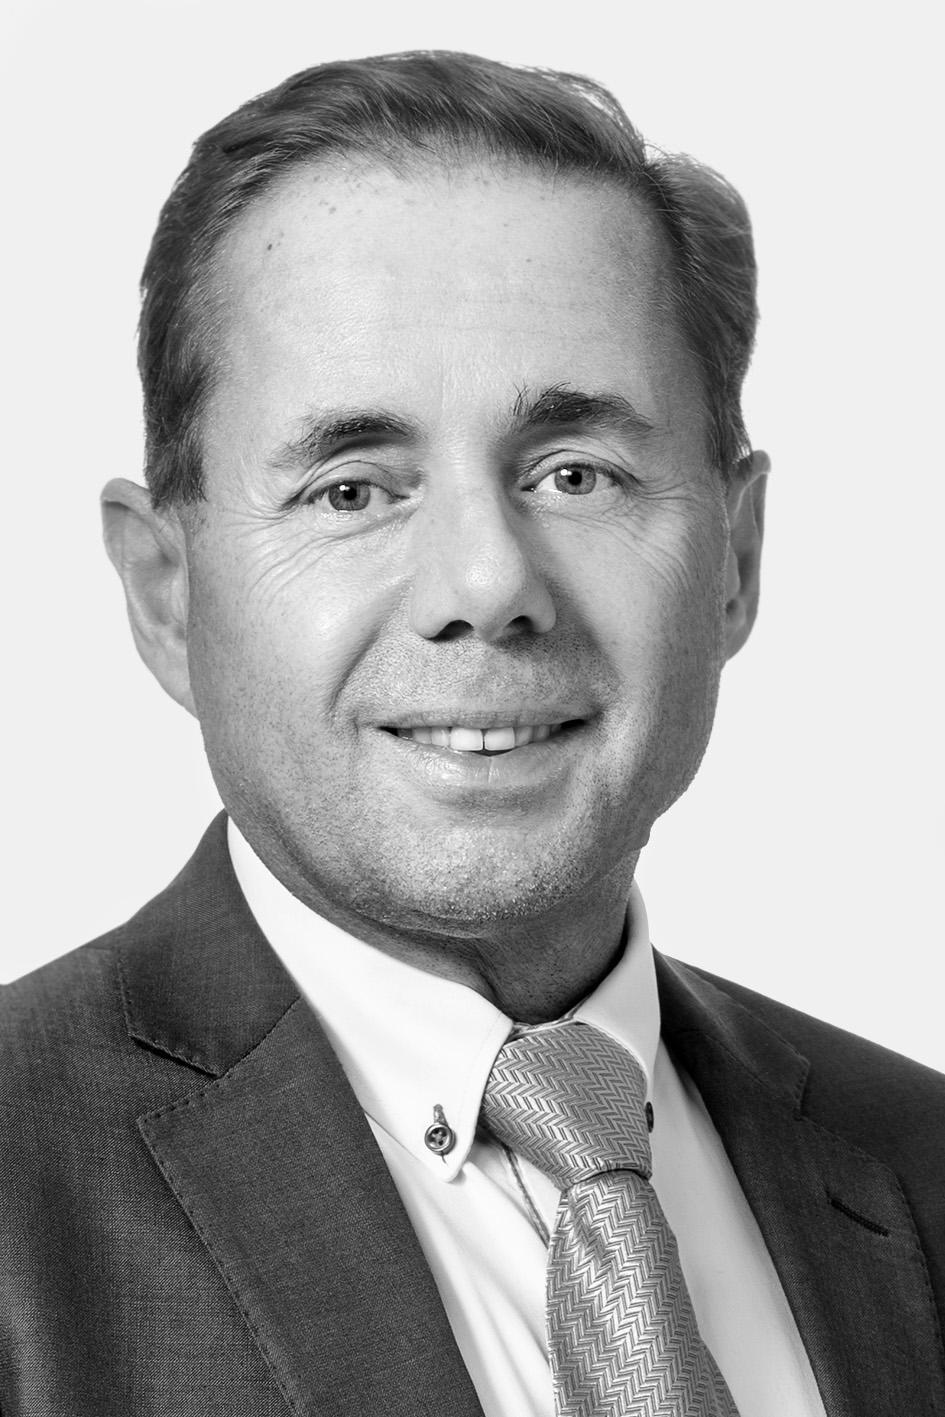 Joakim Winthergard